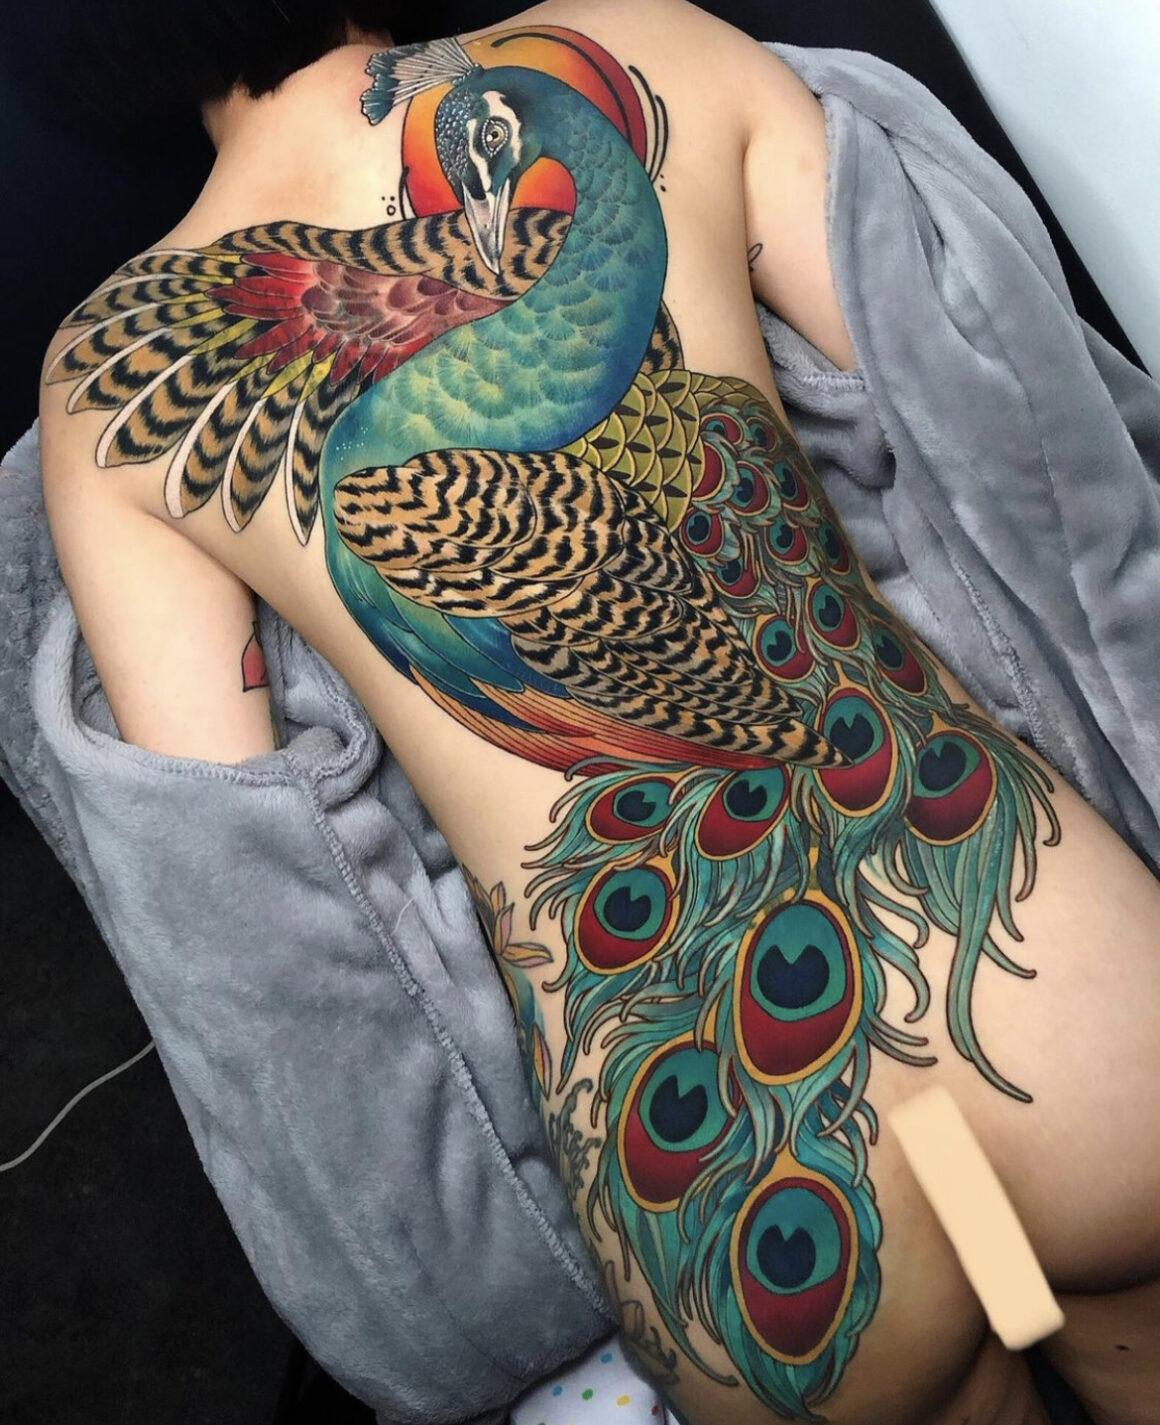 Jina, Allday Tattoo, Kyonggi-Do, Korea